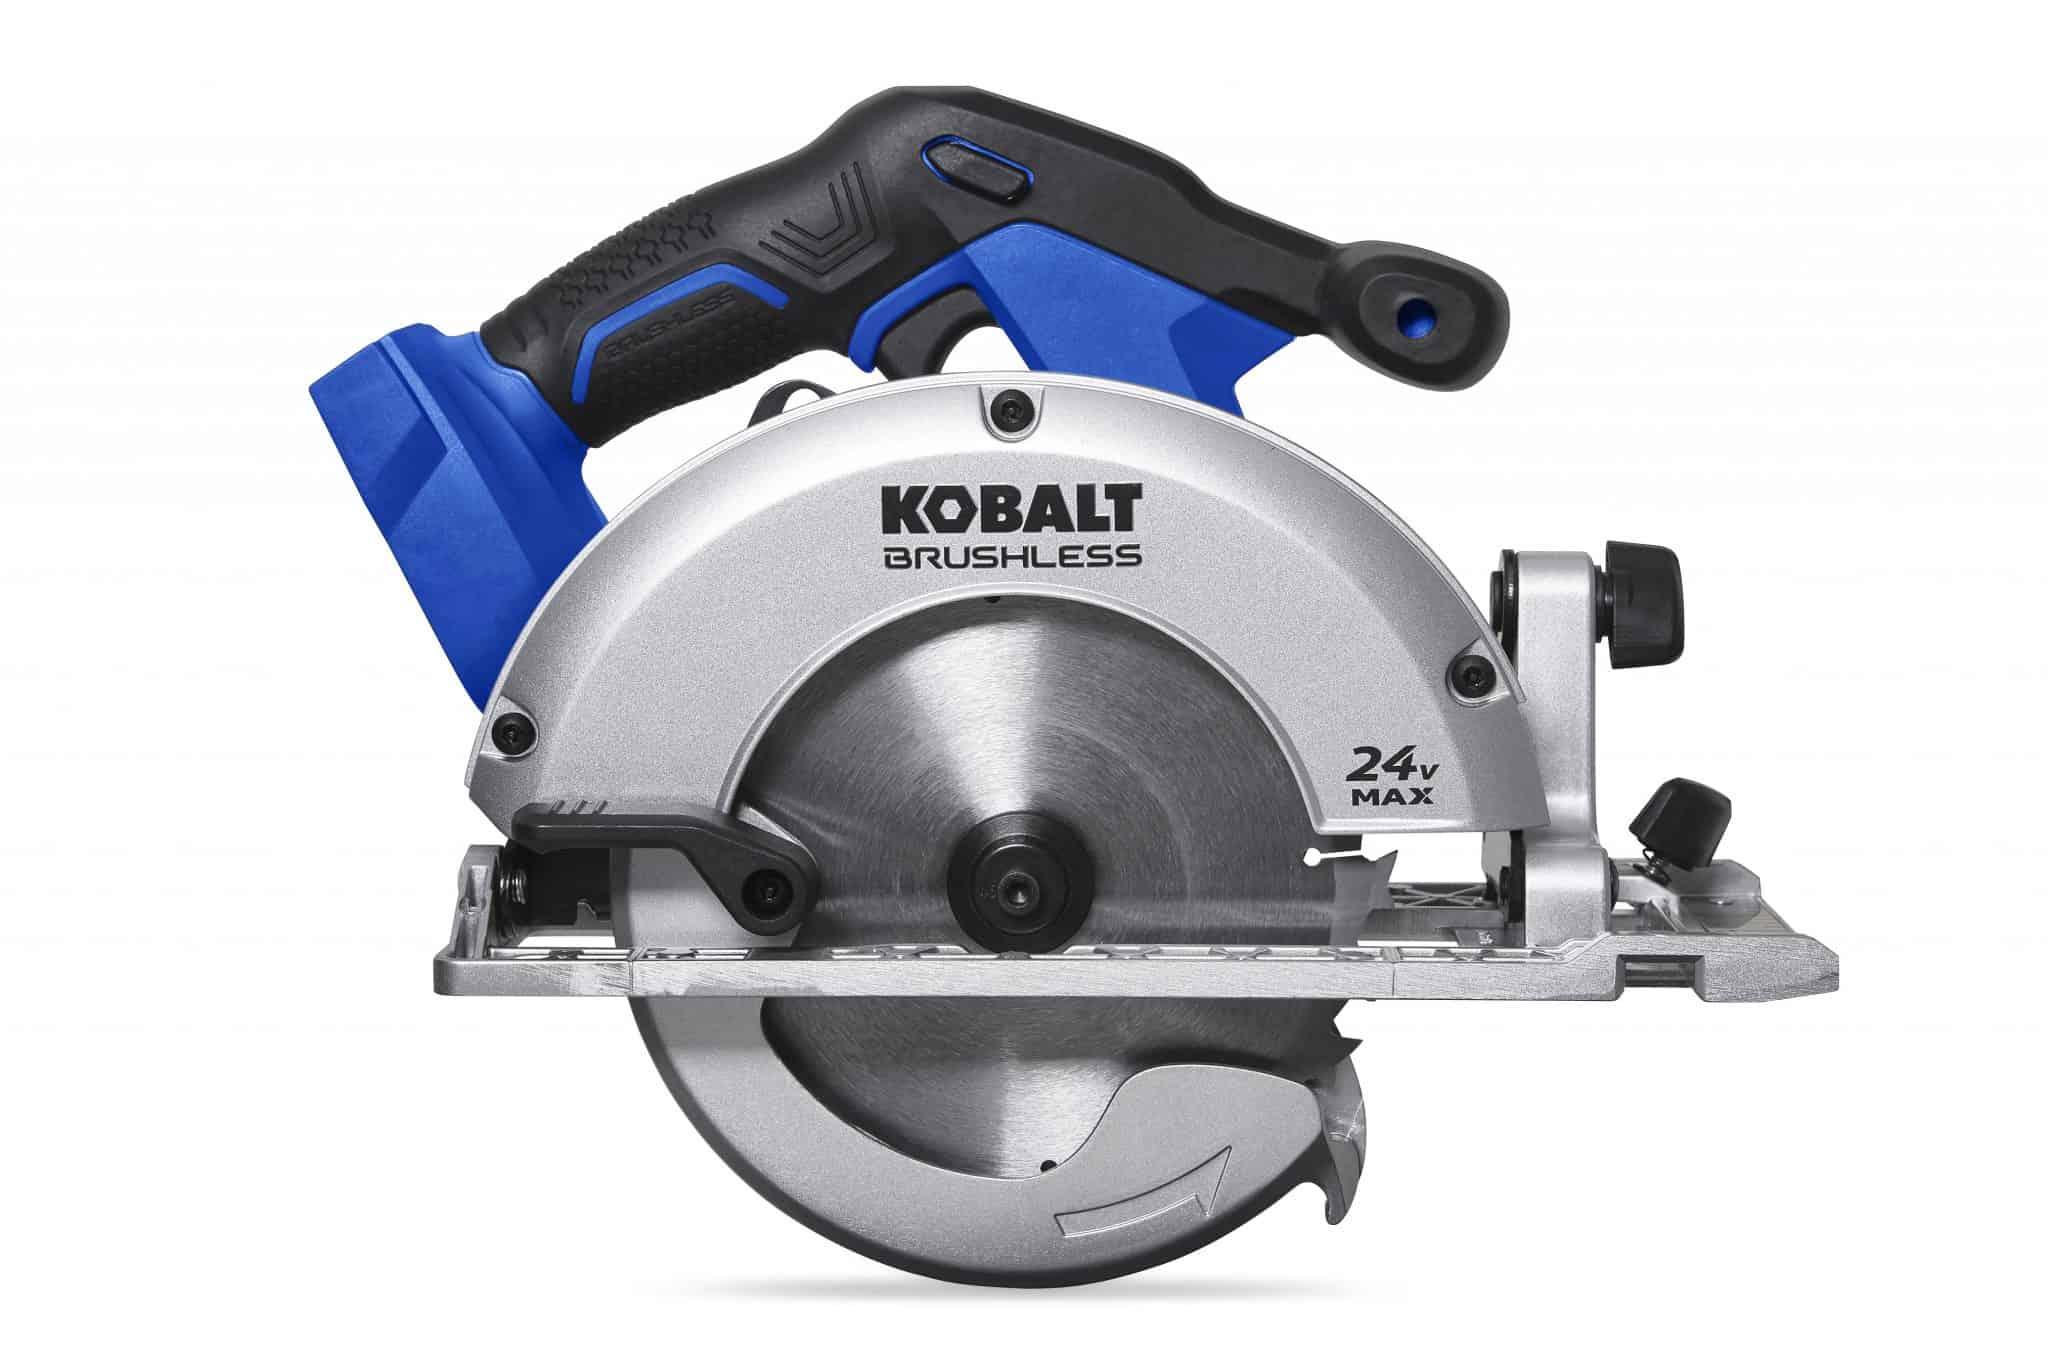 24V 6 0.5 inch Circular Saw2 672830